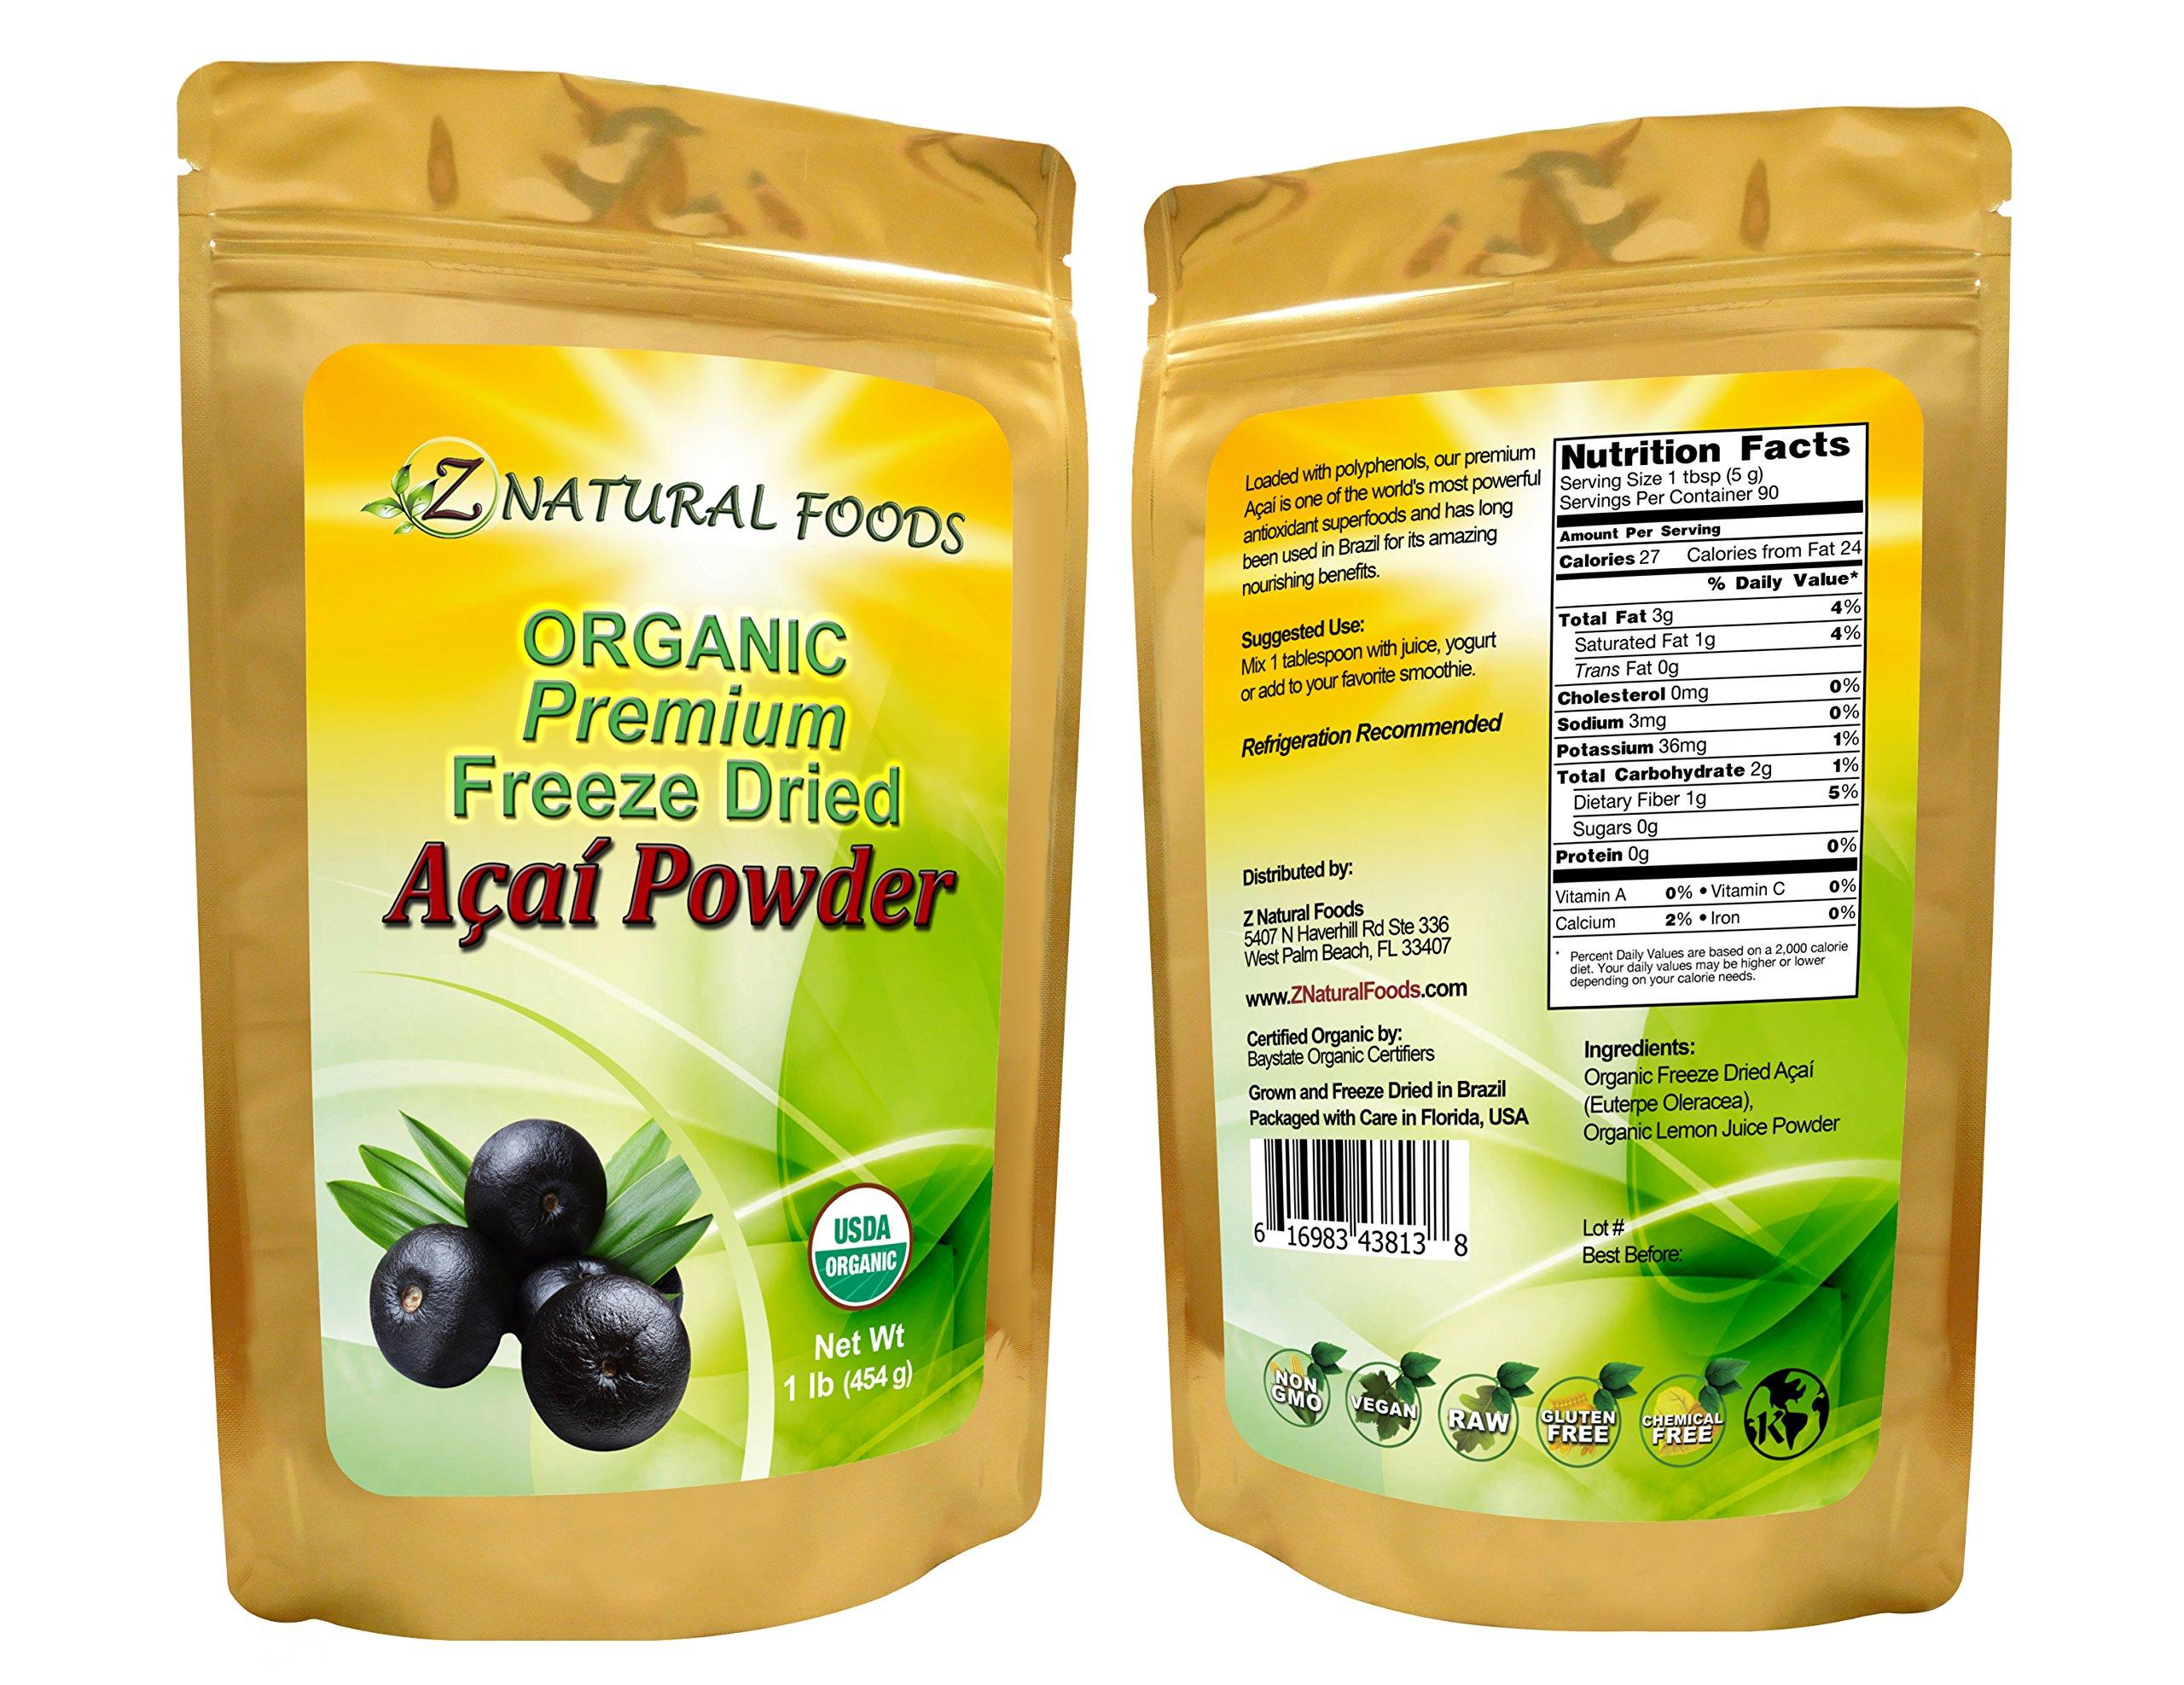 Fresh, Organic Raw Acai Berry Powder, Superfood - Antioxidant, Premium, Non-GMO, Freeze-Dried, 16 oz (1 lb)